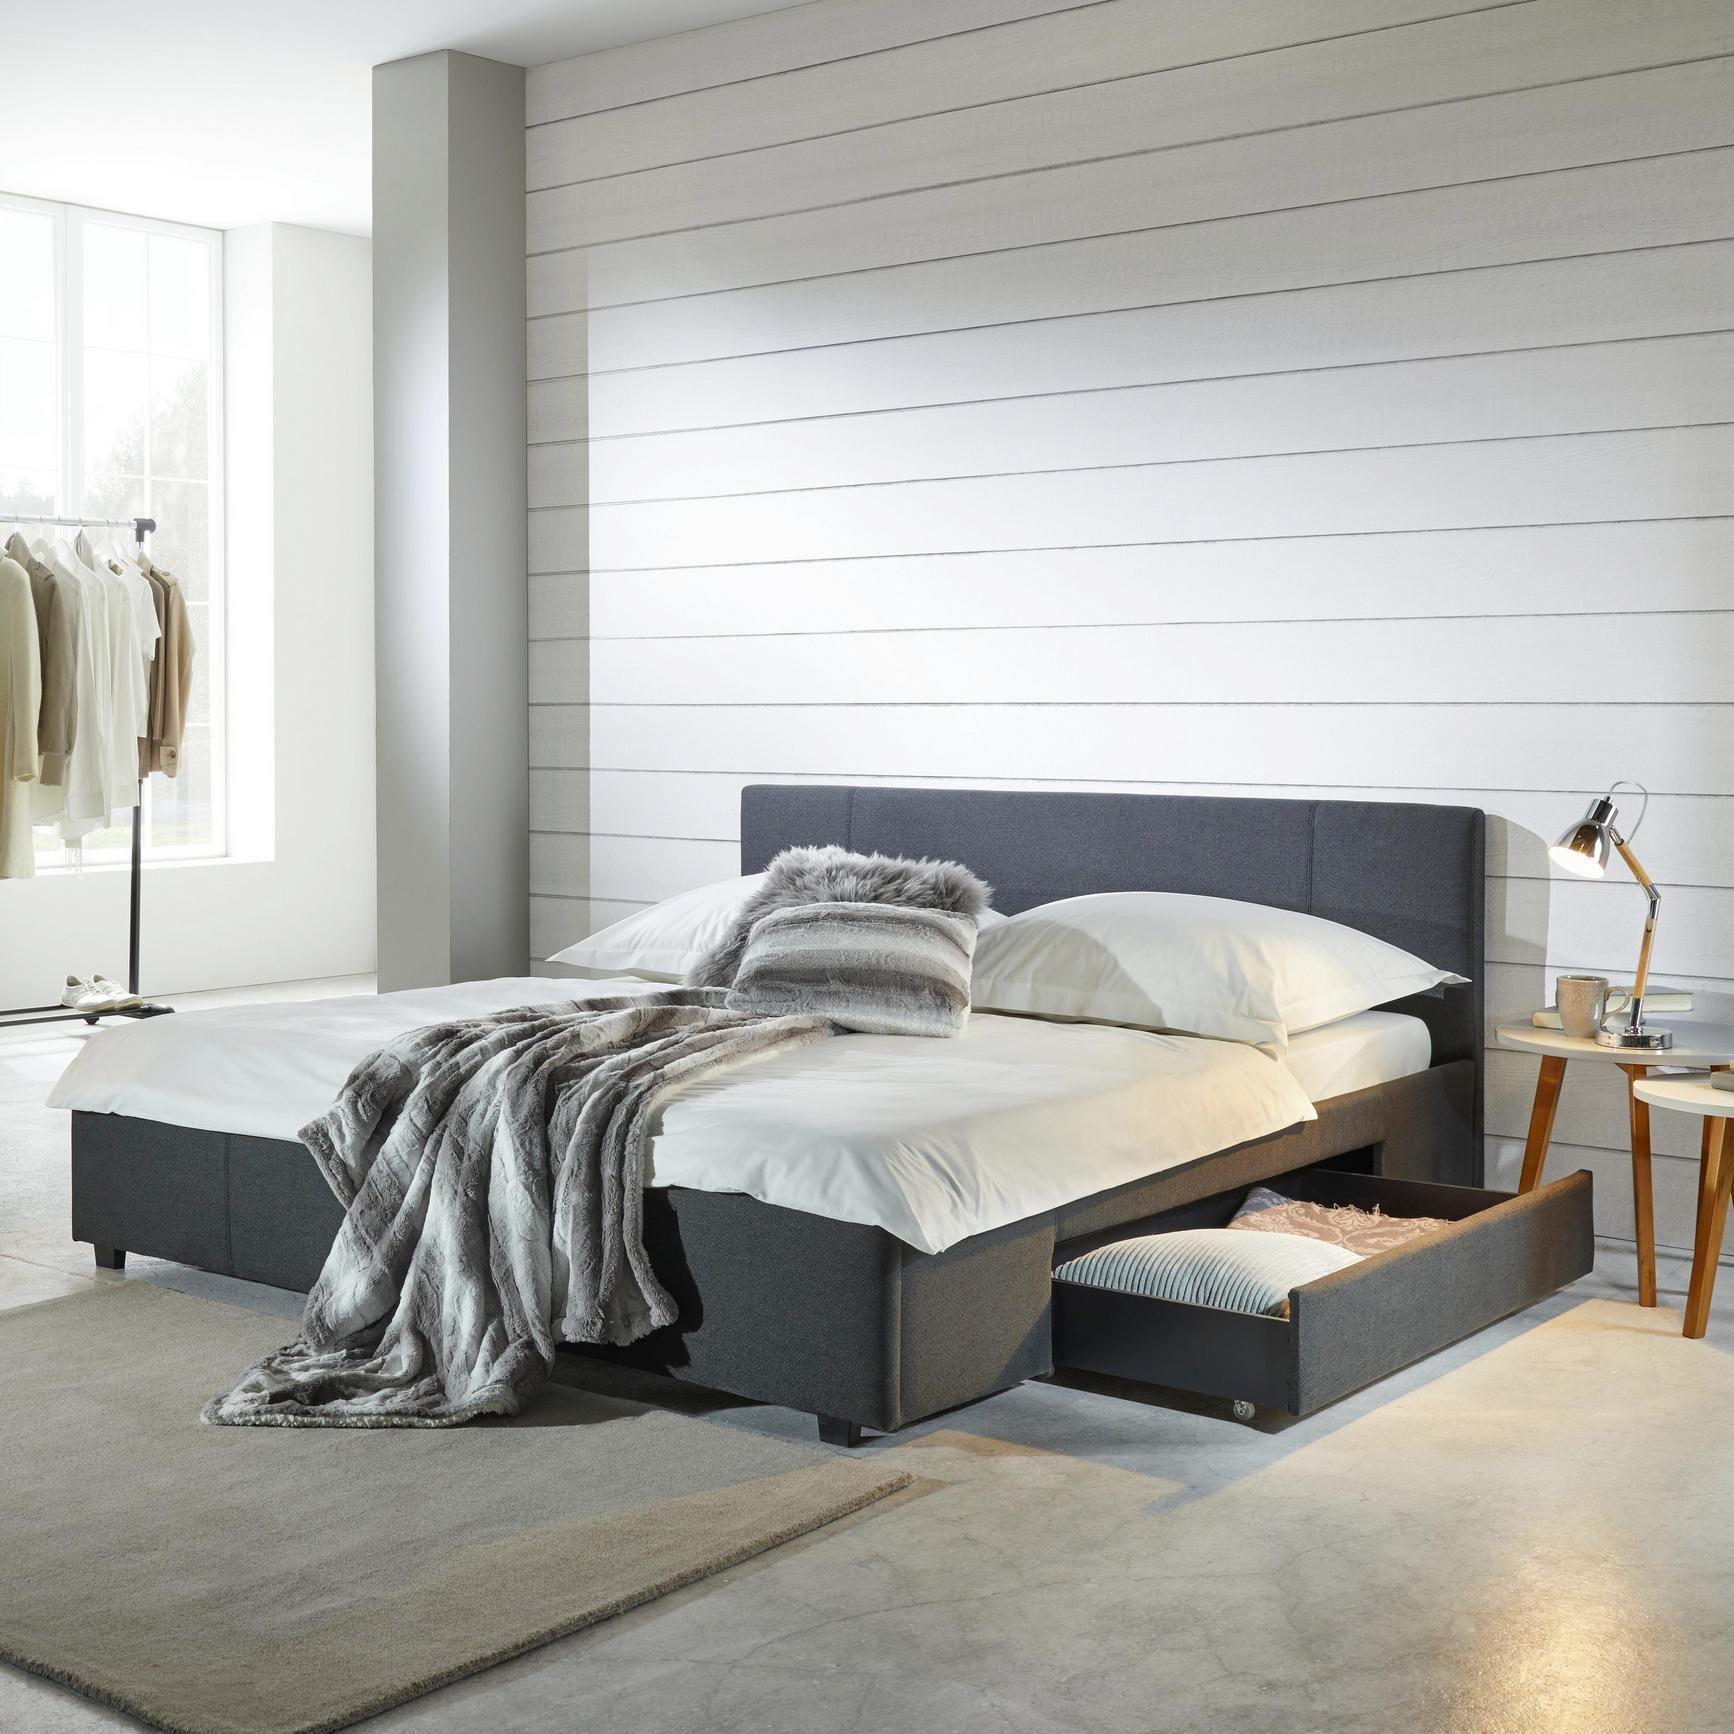 Polsterbett Maila 180x200cm Inkl Bettladen Online Kaufen Momax